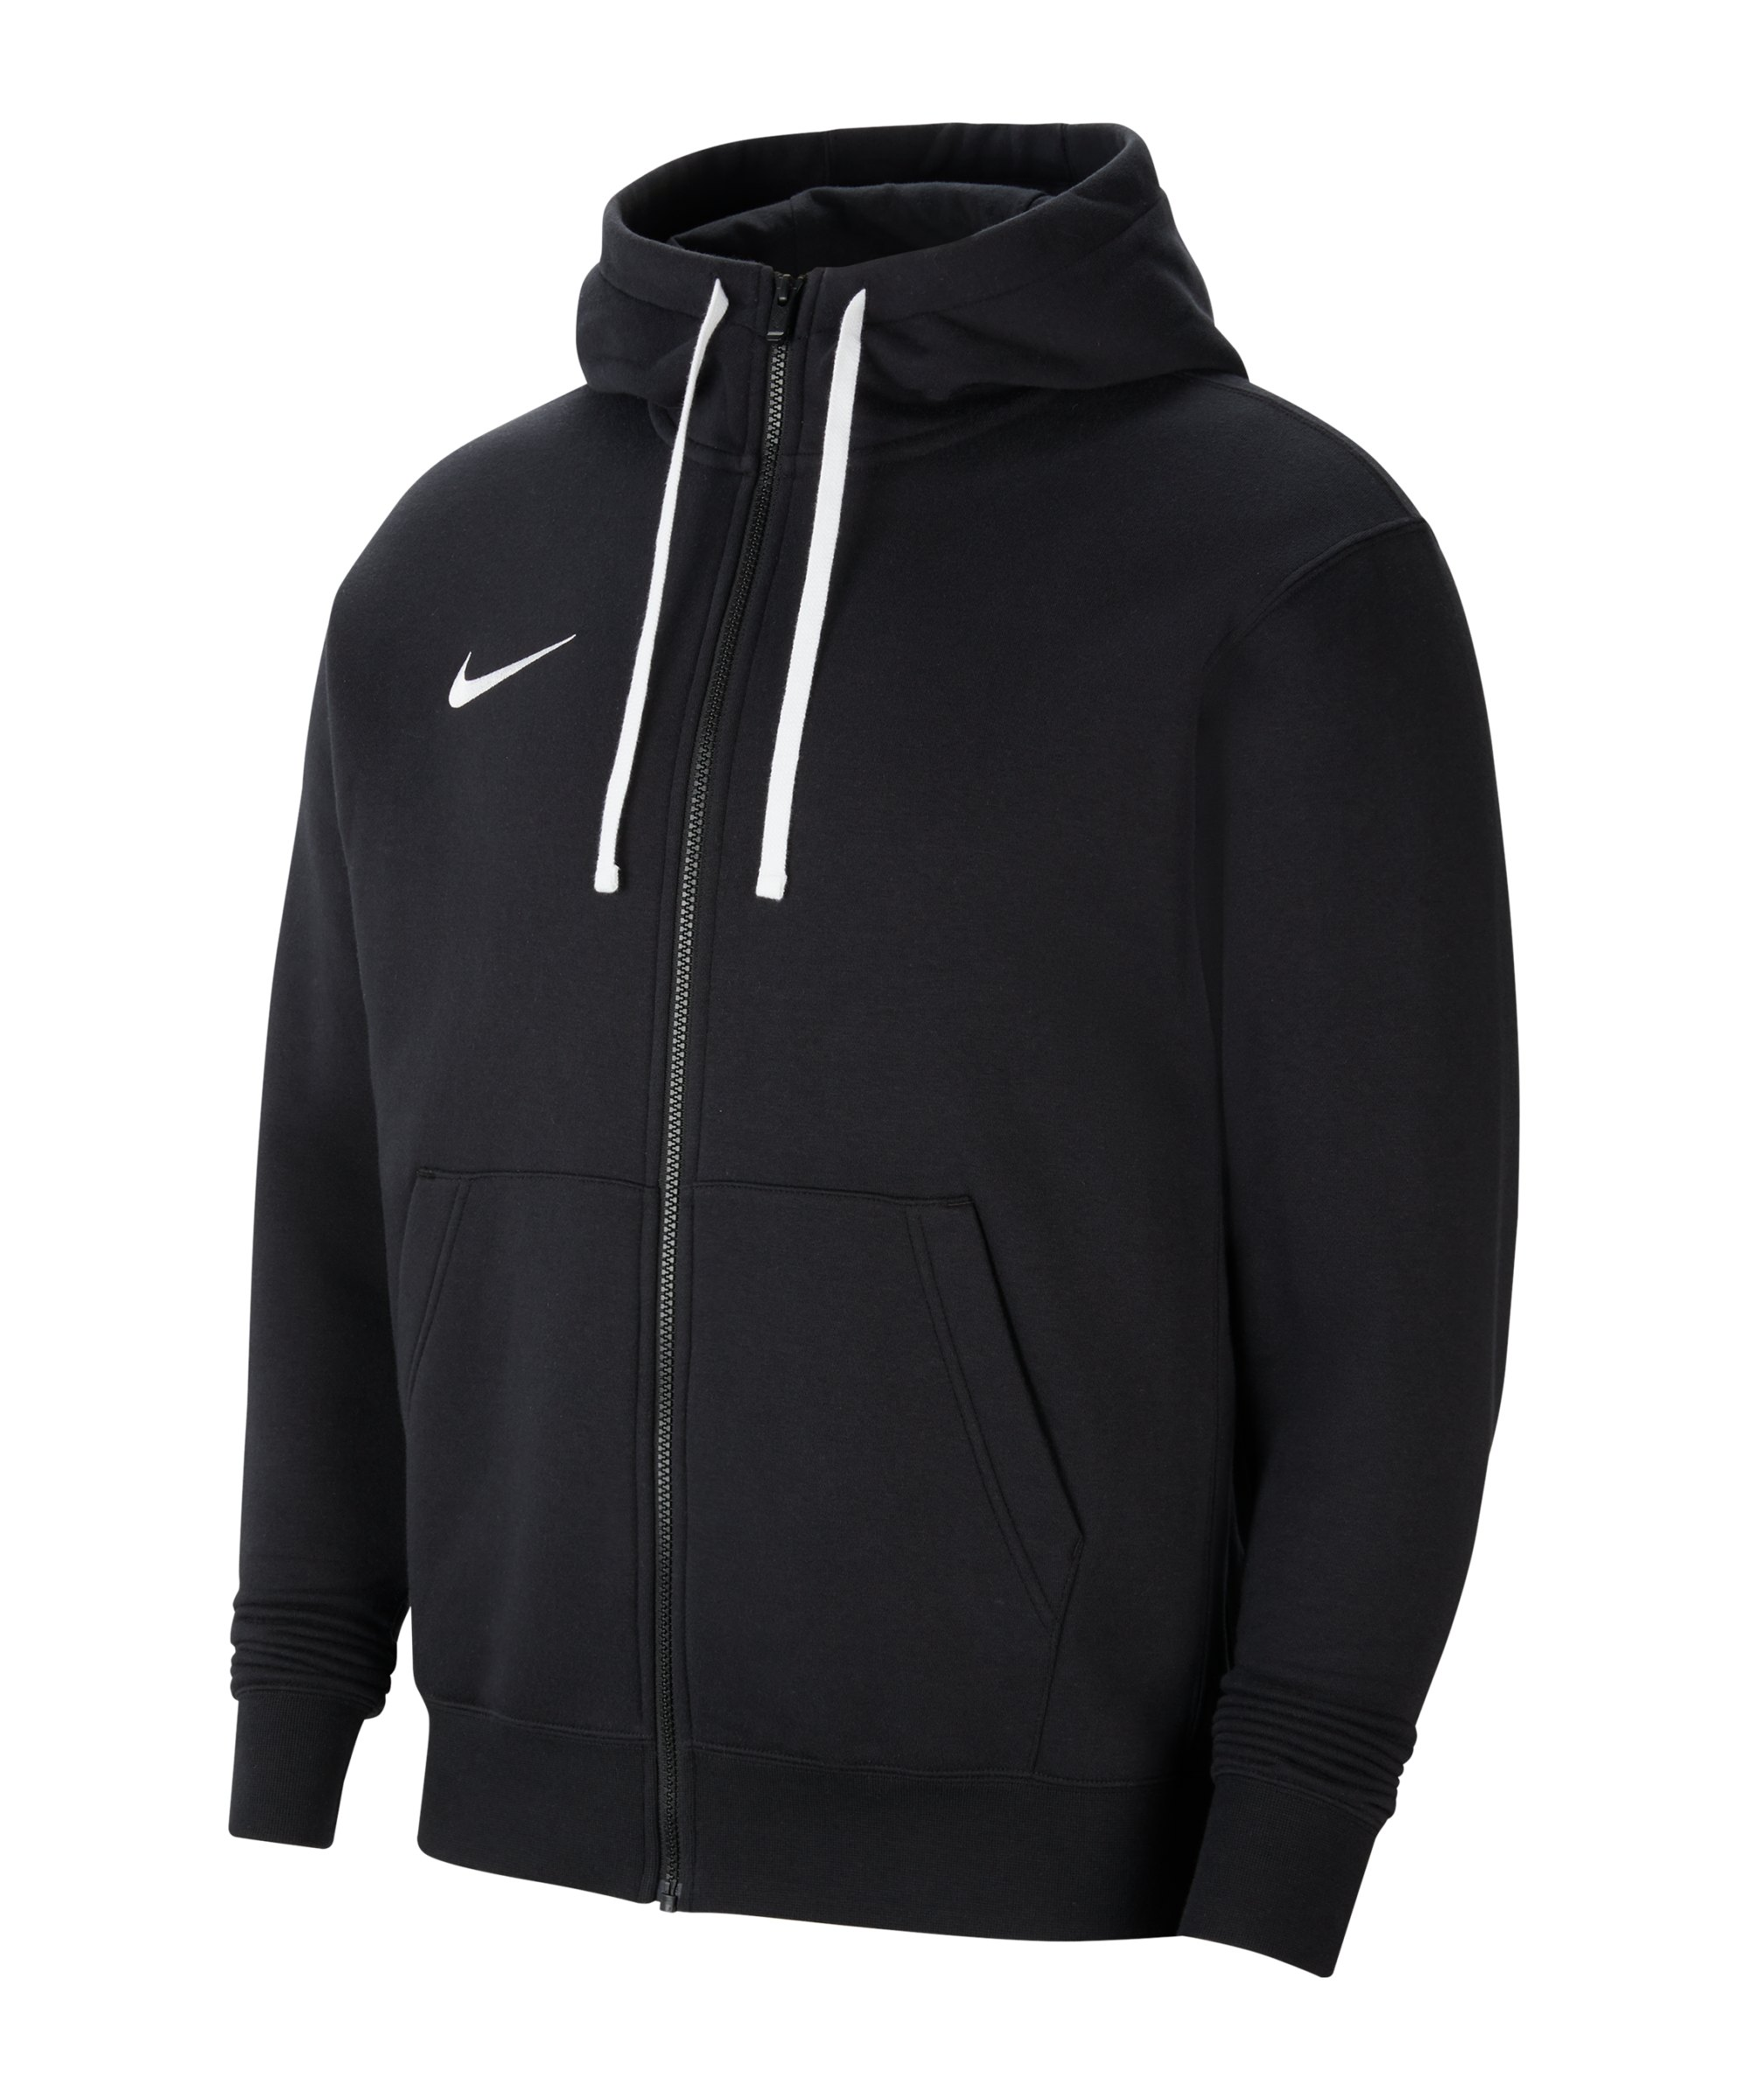 Nike Park 20 Fleece Kapuzenjacke Schwarz F010 - schwarz